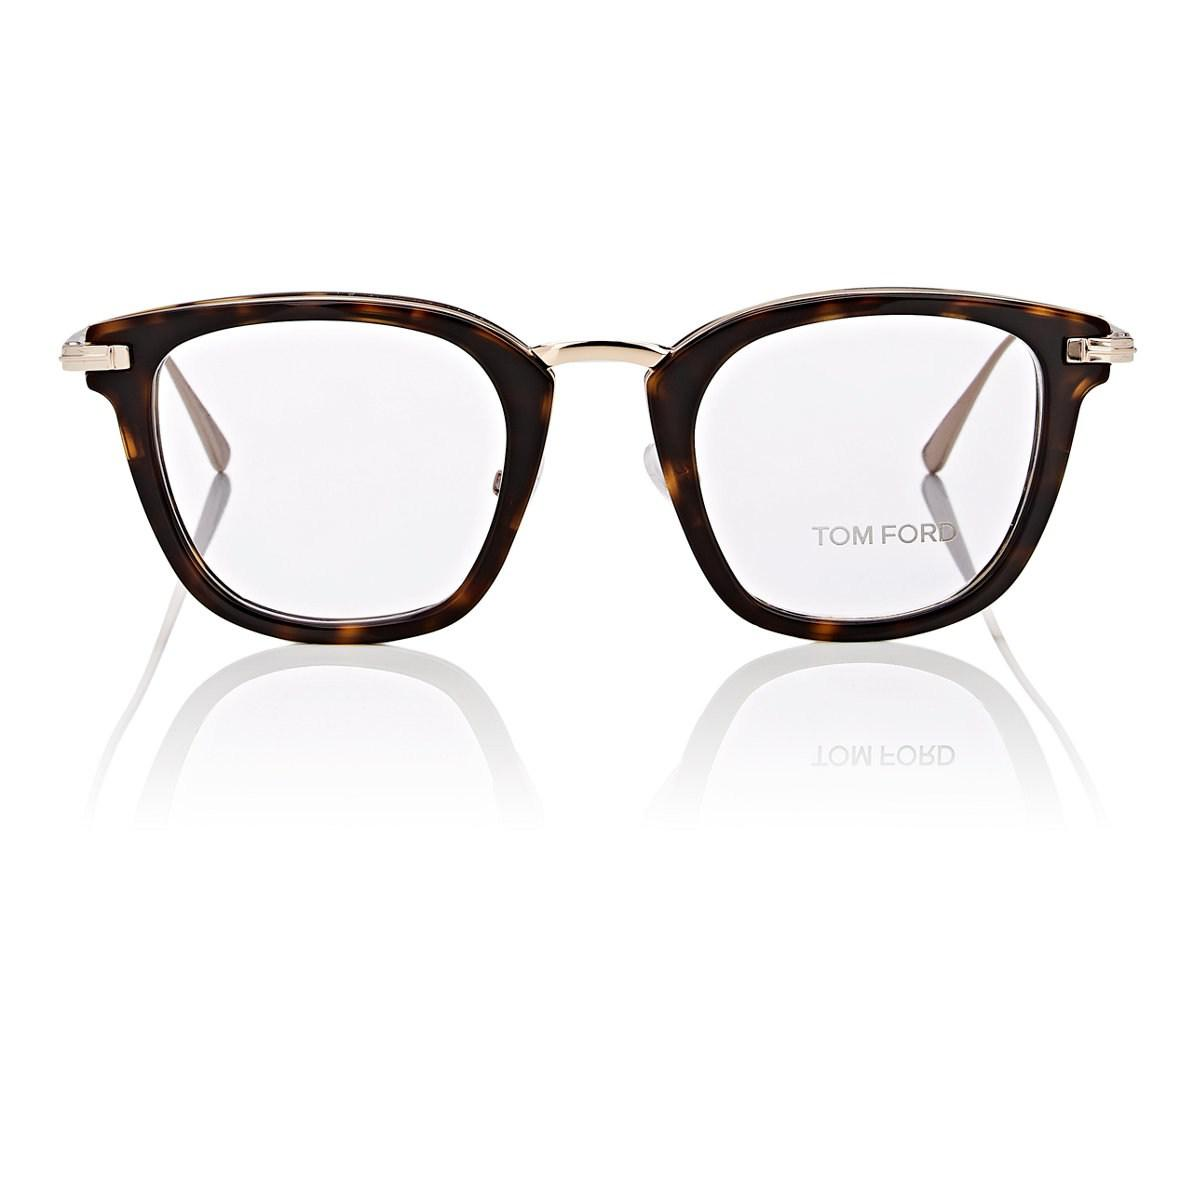 9de68f043c085 Tom Ford Tf5496 Eyeglasses in Brown for Men - Lyst